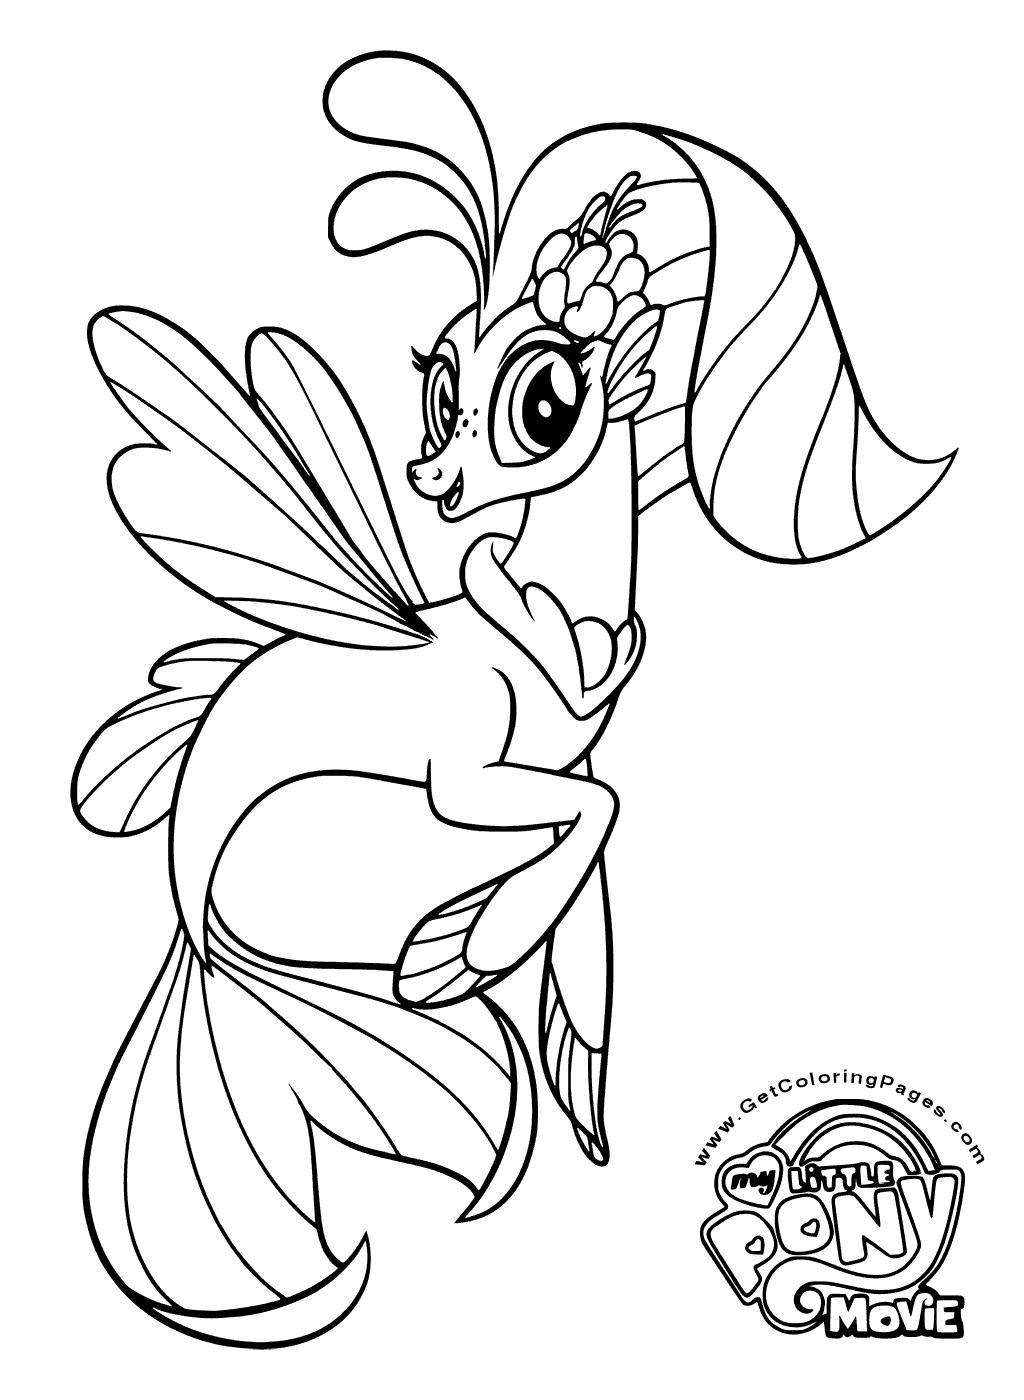 Pin By Anita Krajewska On Kolorowanki My Little Pony Coloring Mermaid Coloring Pages My Little Pony Printable